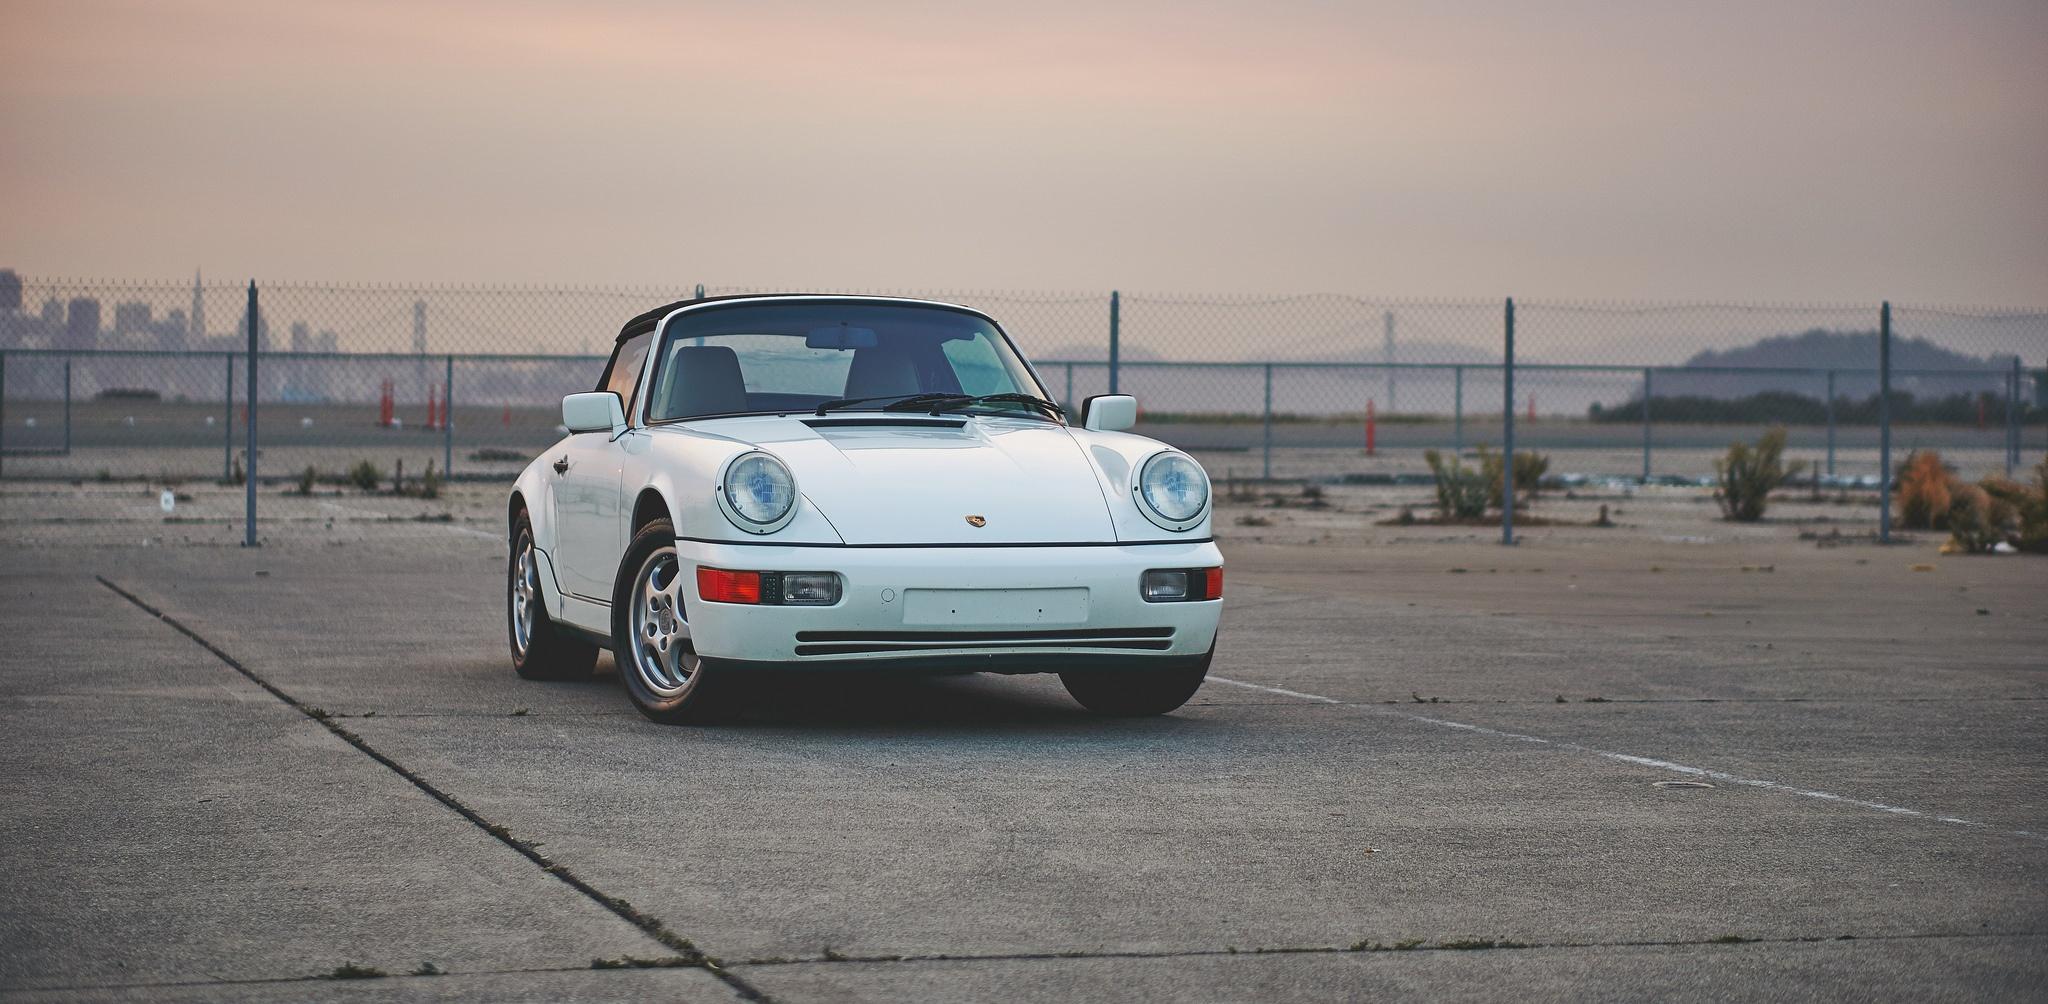 Weekend Wallpaper: 1991 Porsche Carrera C2 Cabriolet